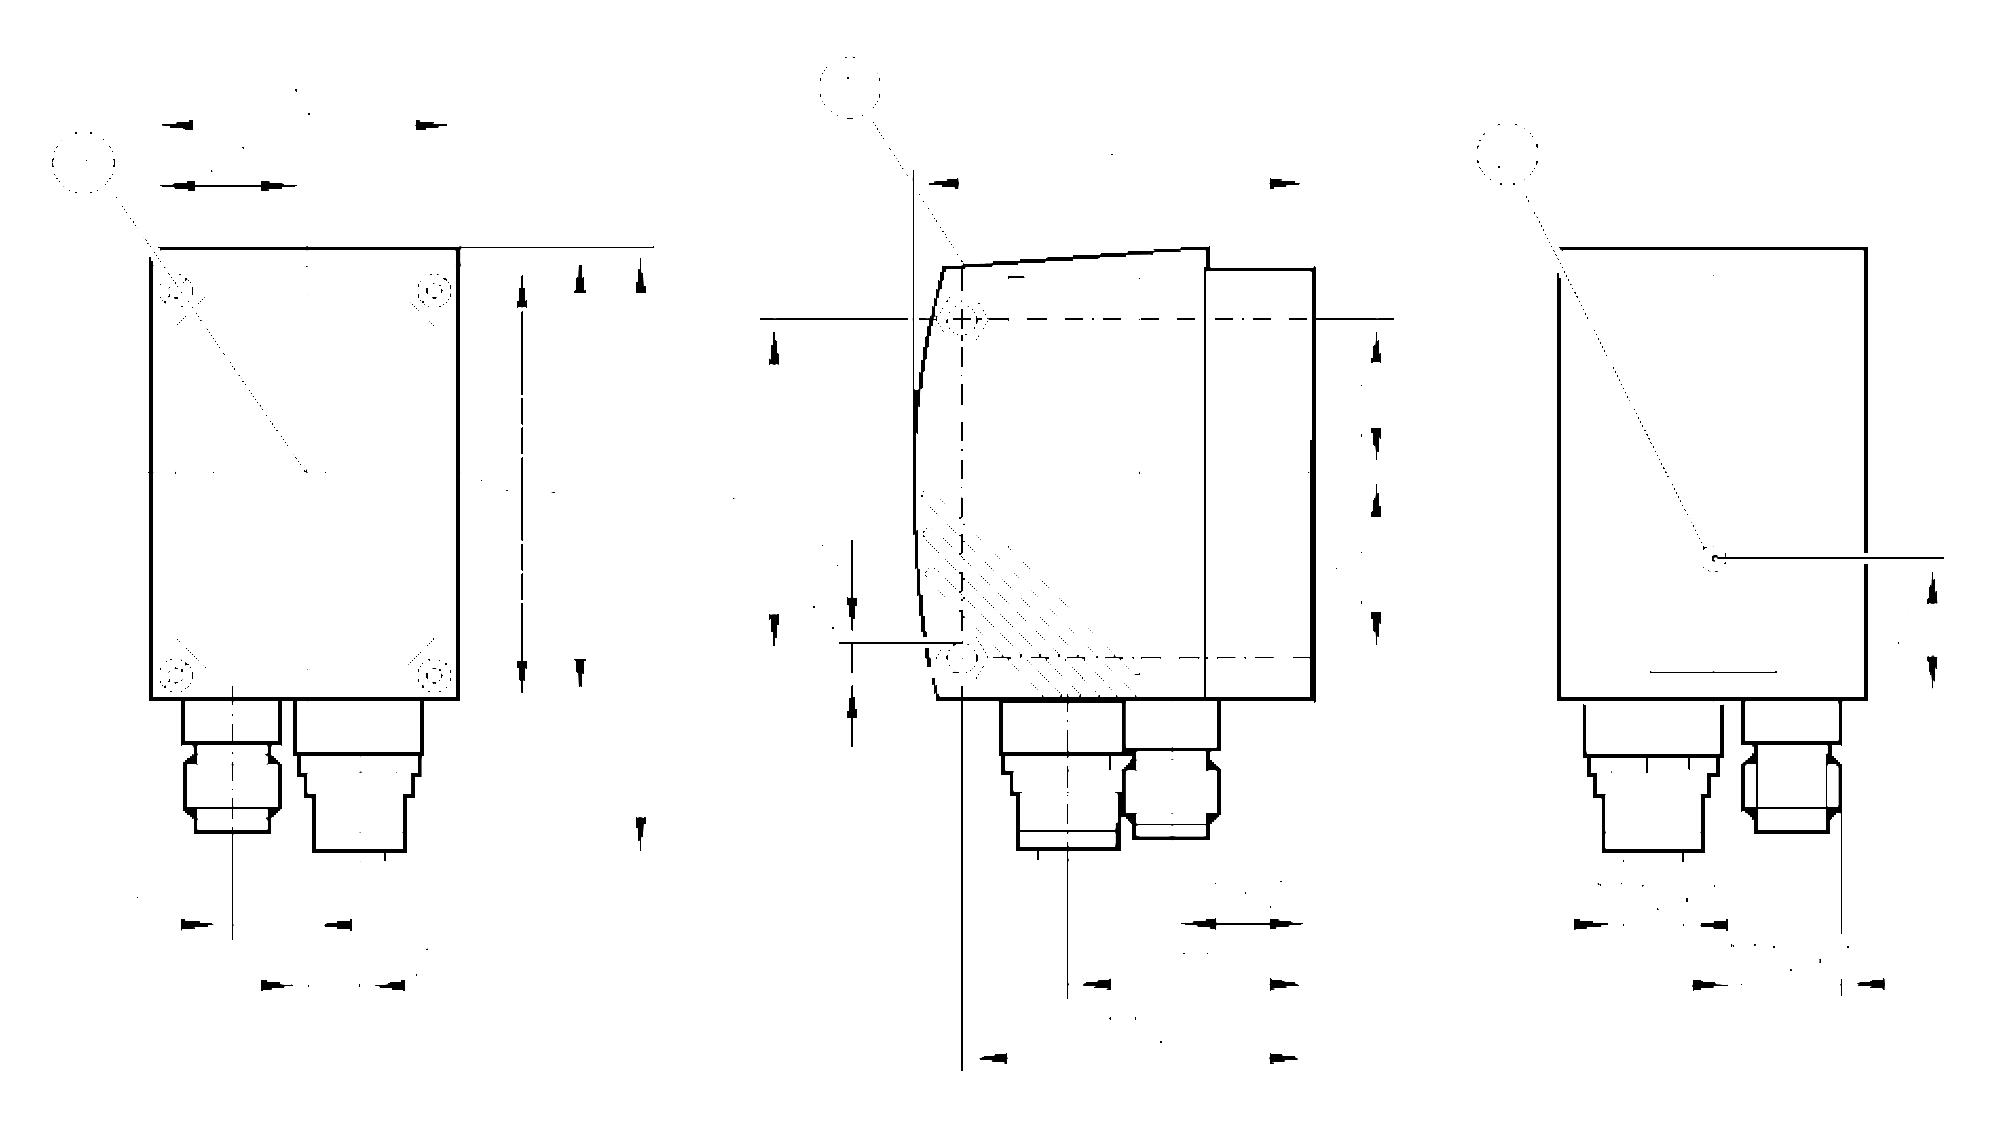 o2d222 - object recognition sensor